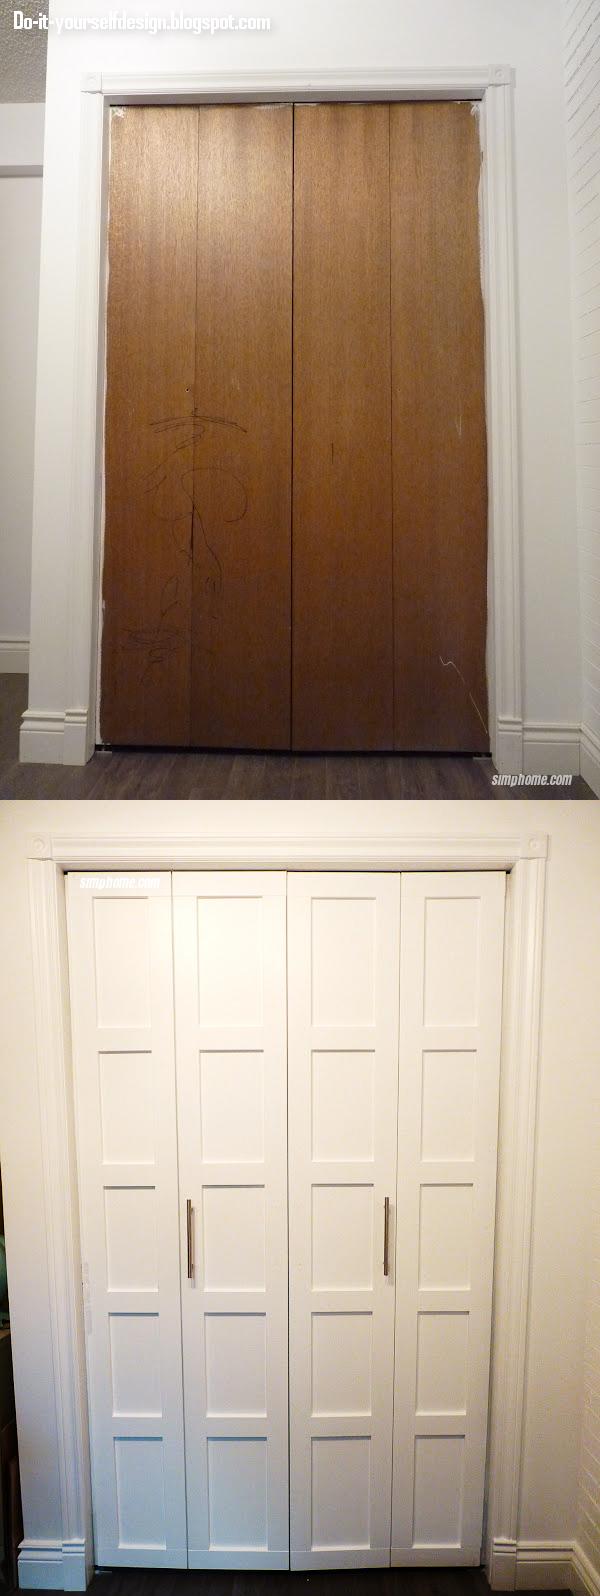 3. SIMPHOME.COM Add Trims to Your Bi Fold Cupboard Doors